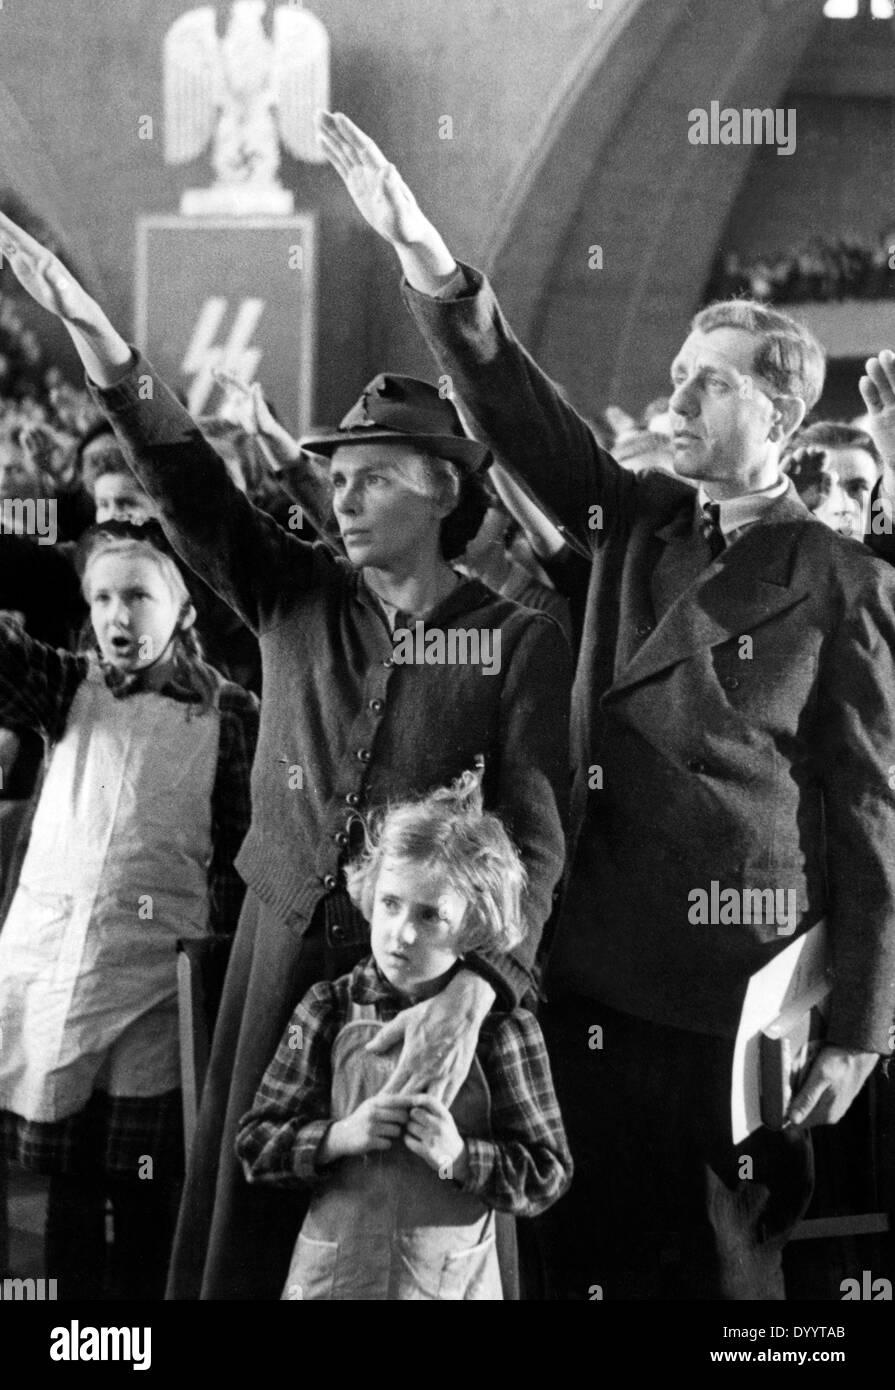 Naturalization of Bokovina Germans, 1941 - Stock Image